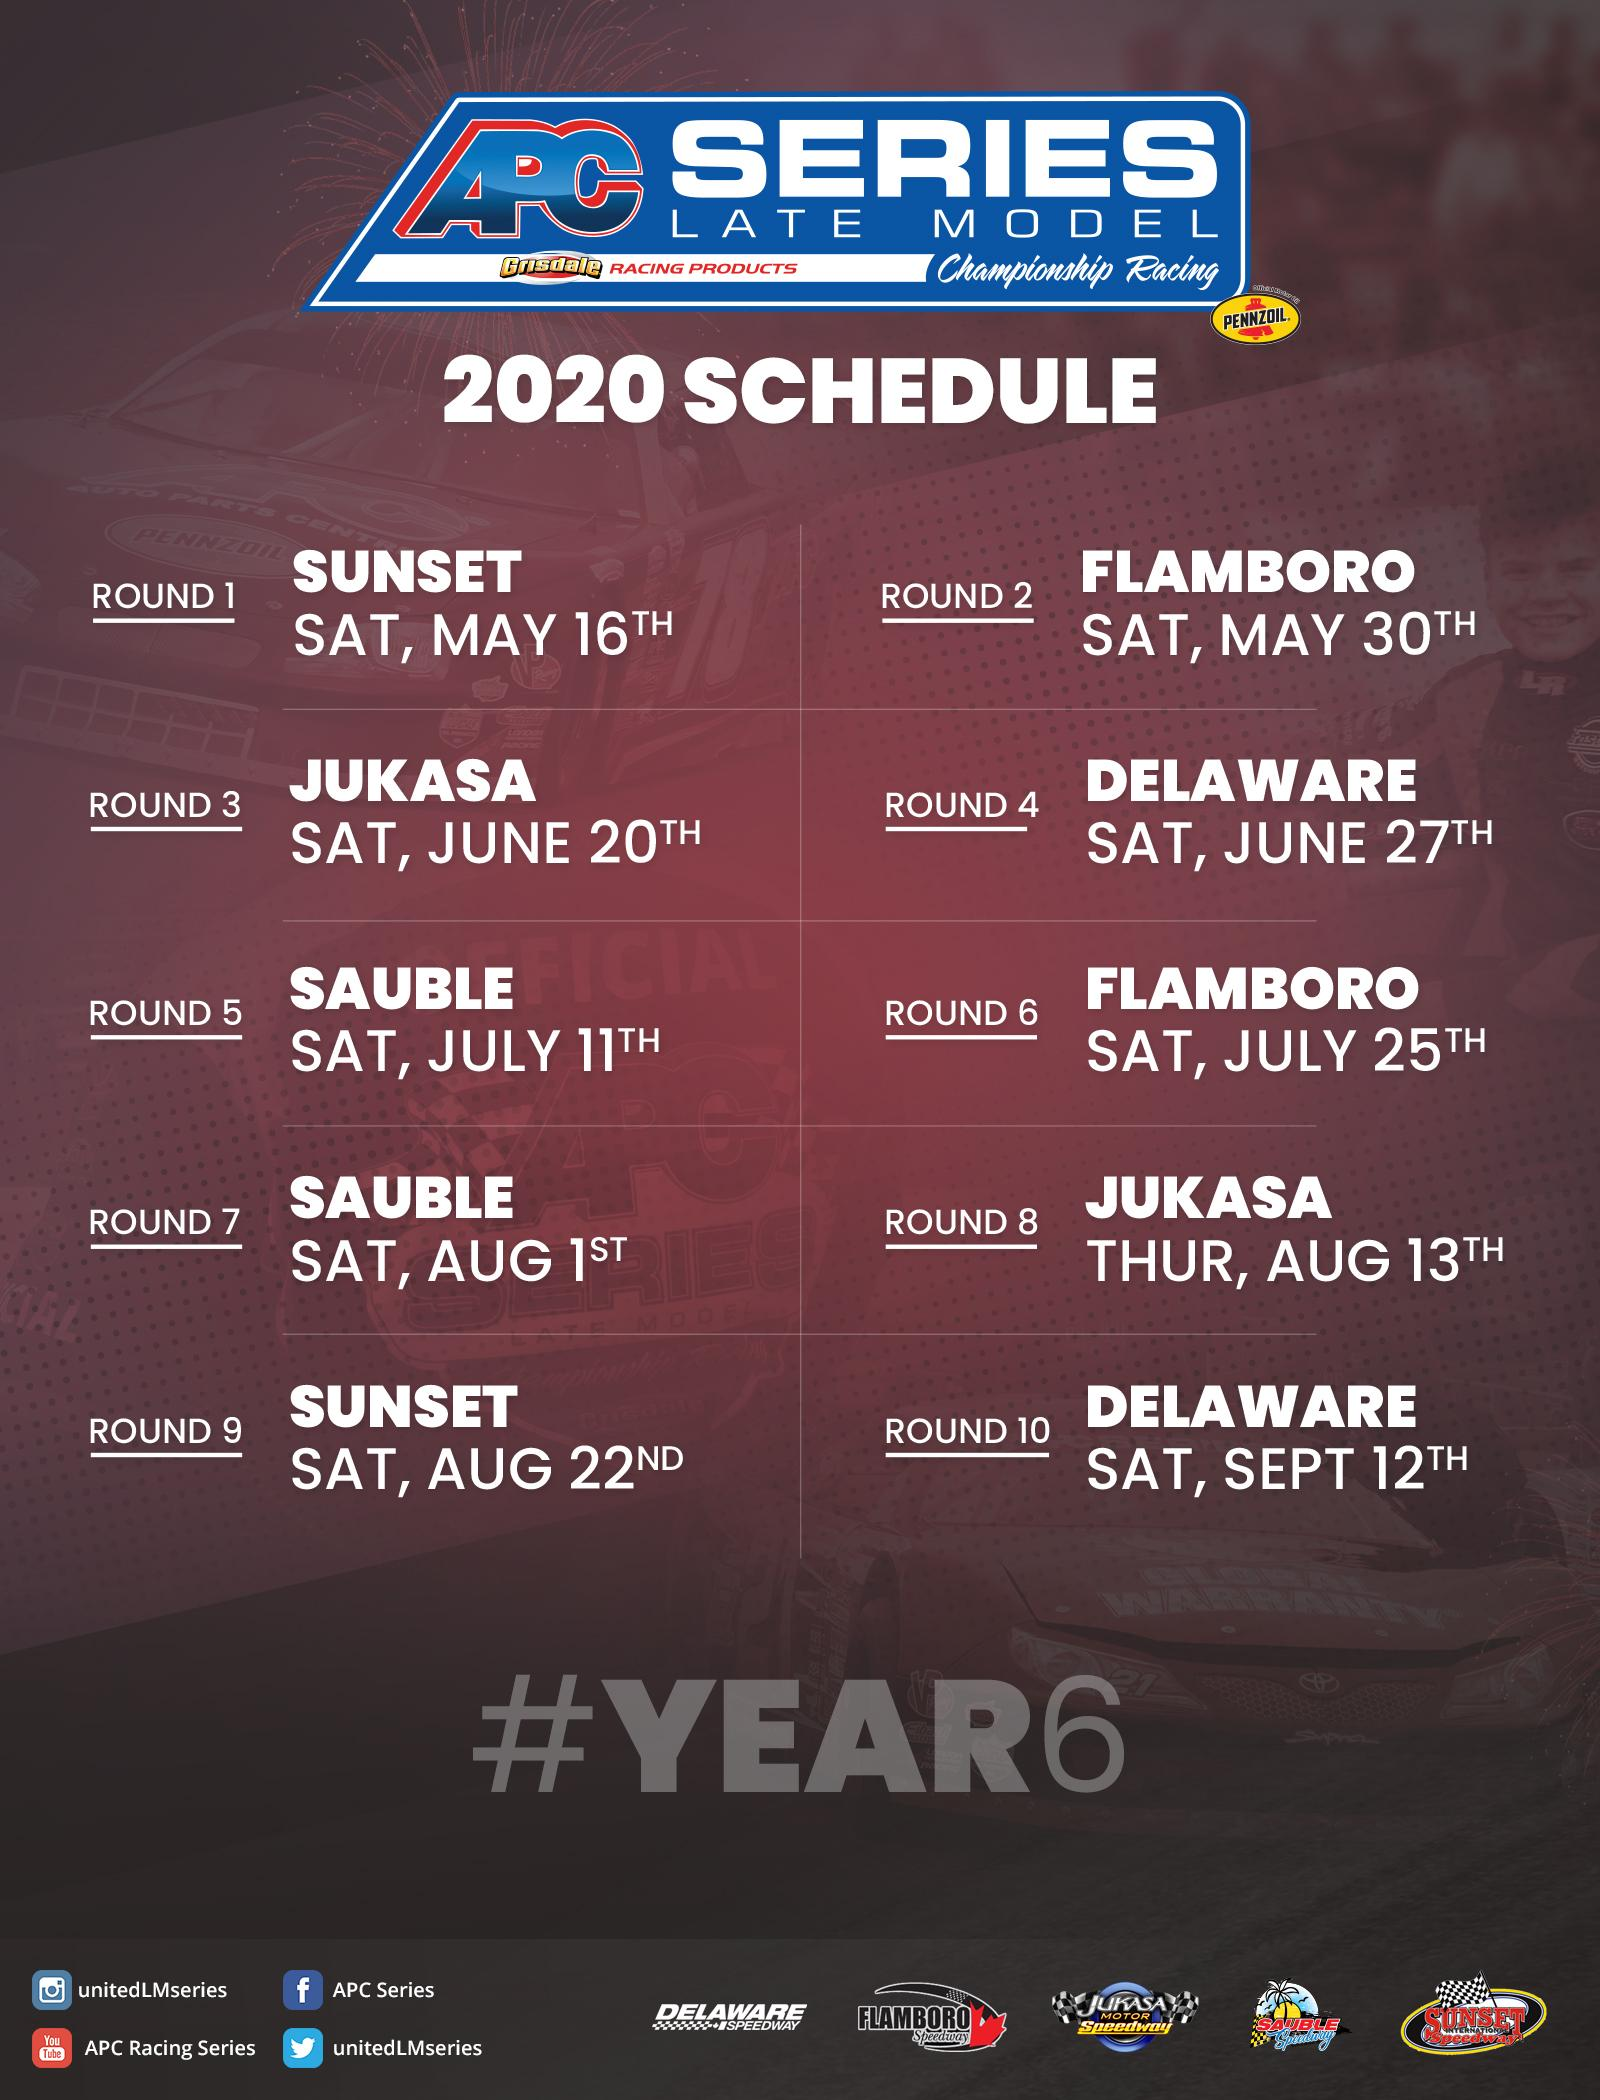 2020 APC Series Schedule